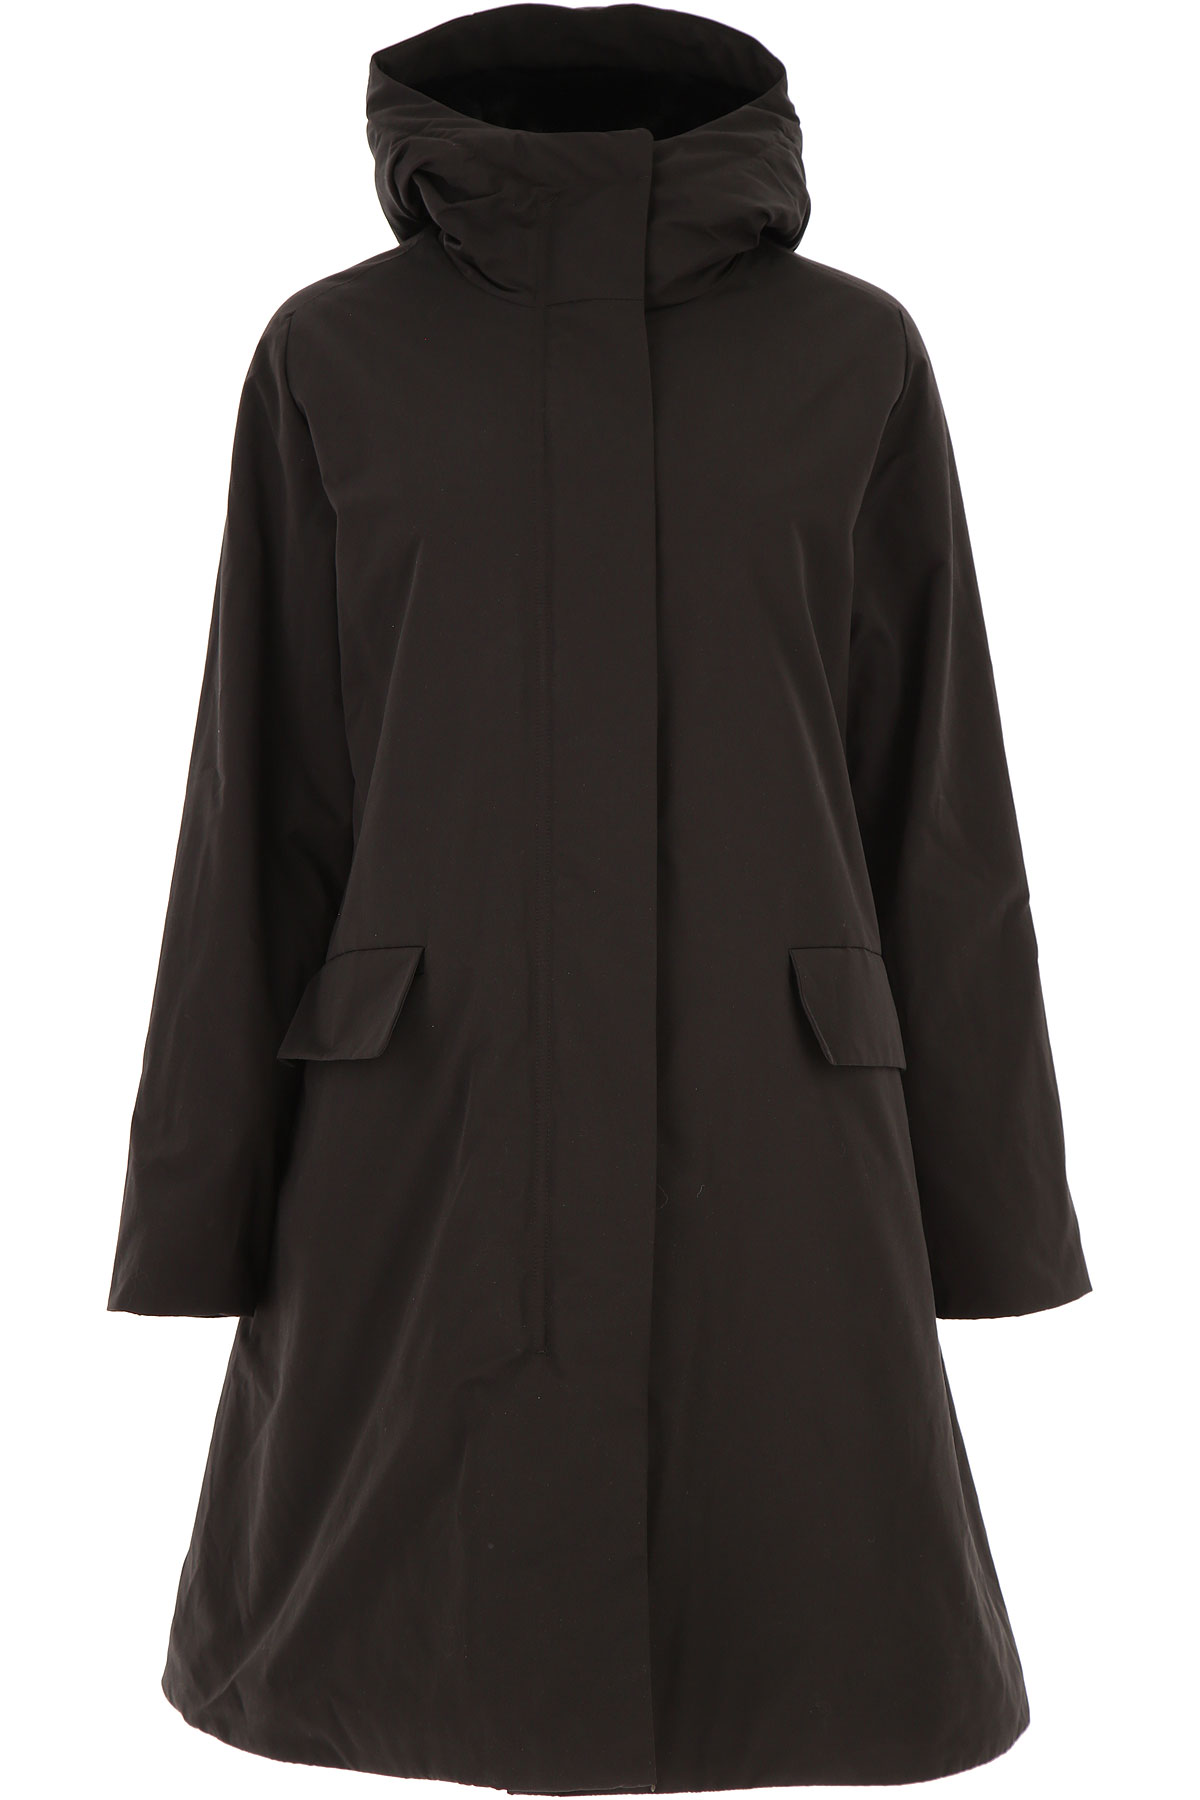 Aspesi Jacket for Women On Sale, Black, Cotton, 2019, 4 6 8